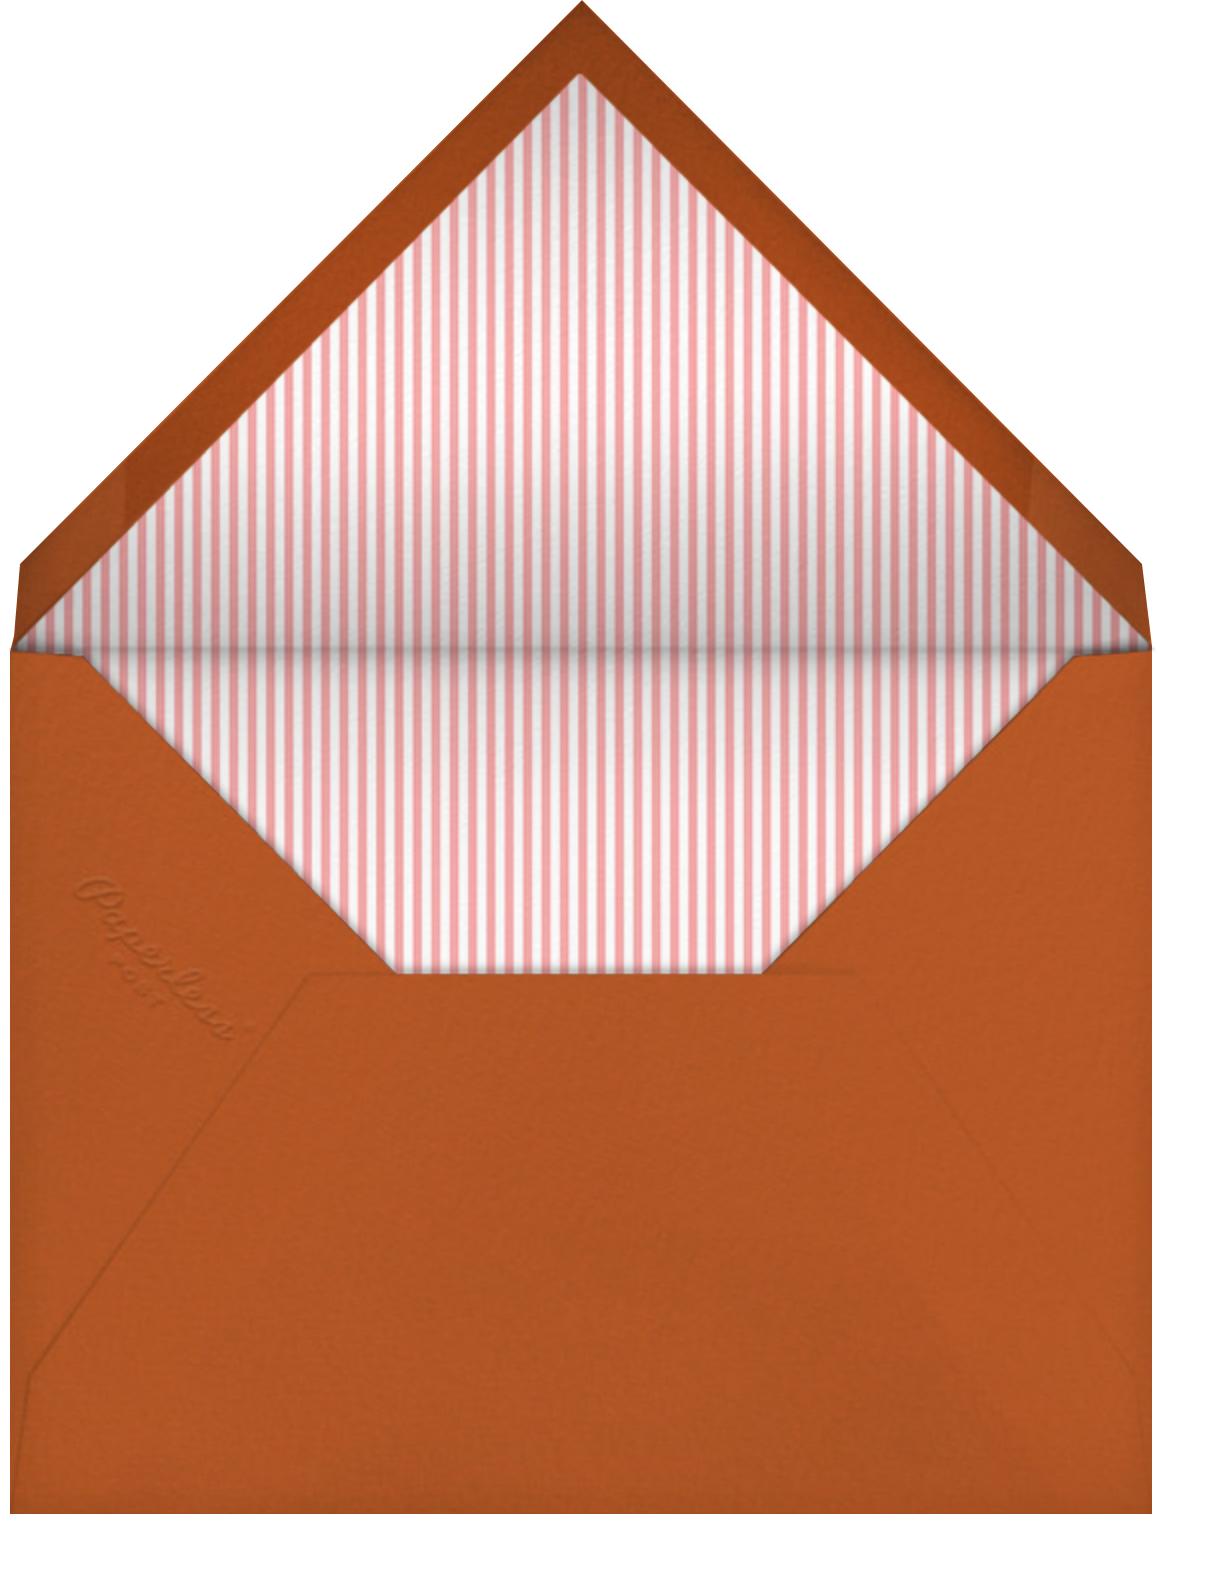 Sea Parade - Little Cube - Baby boy announcements - envelope back